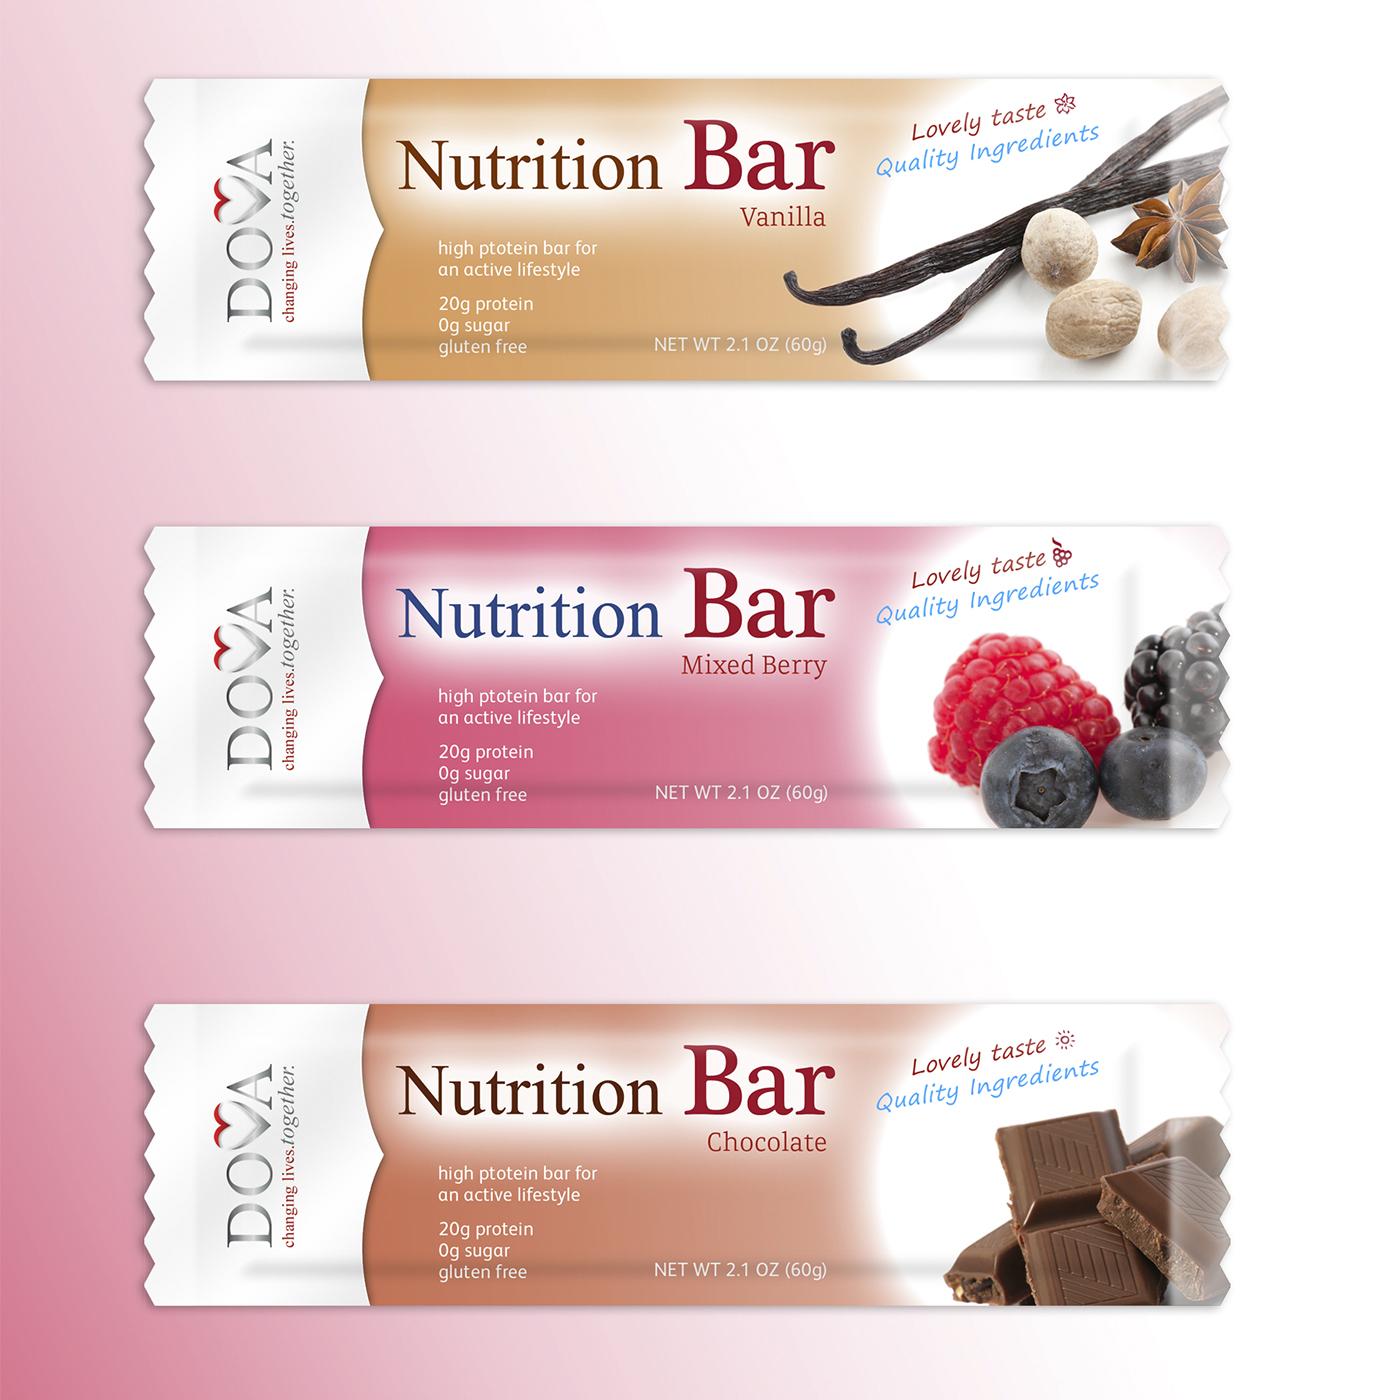 Вкусный дизайн для вкусных Nutrition Bar.